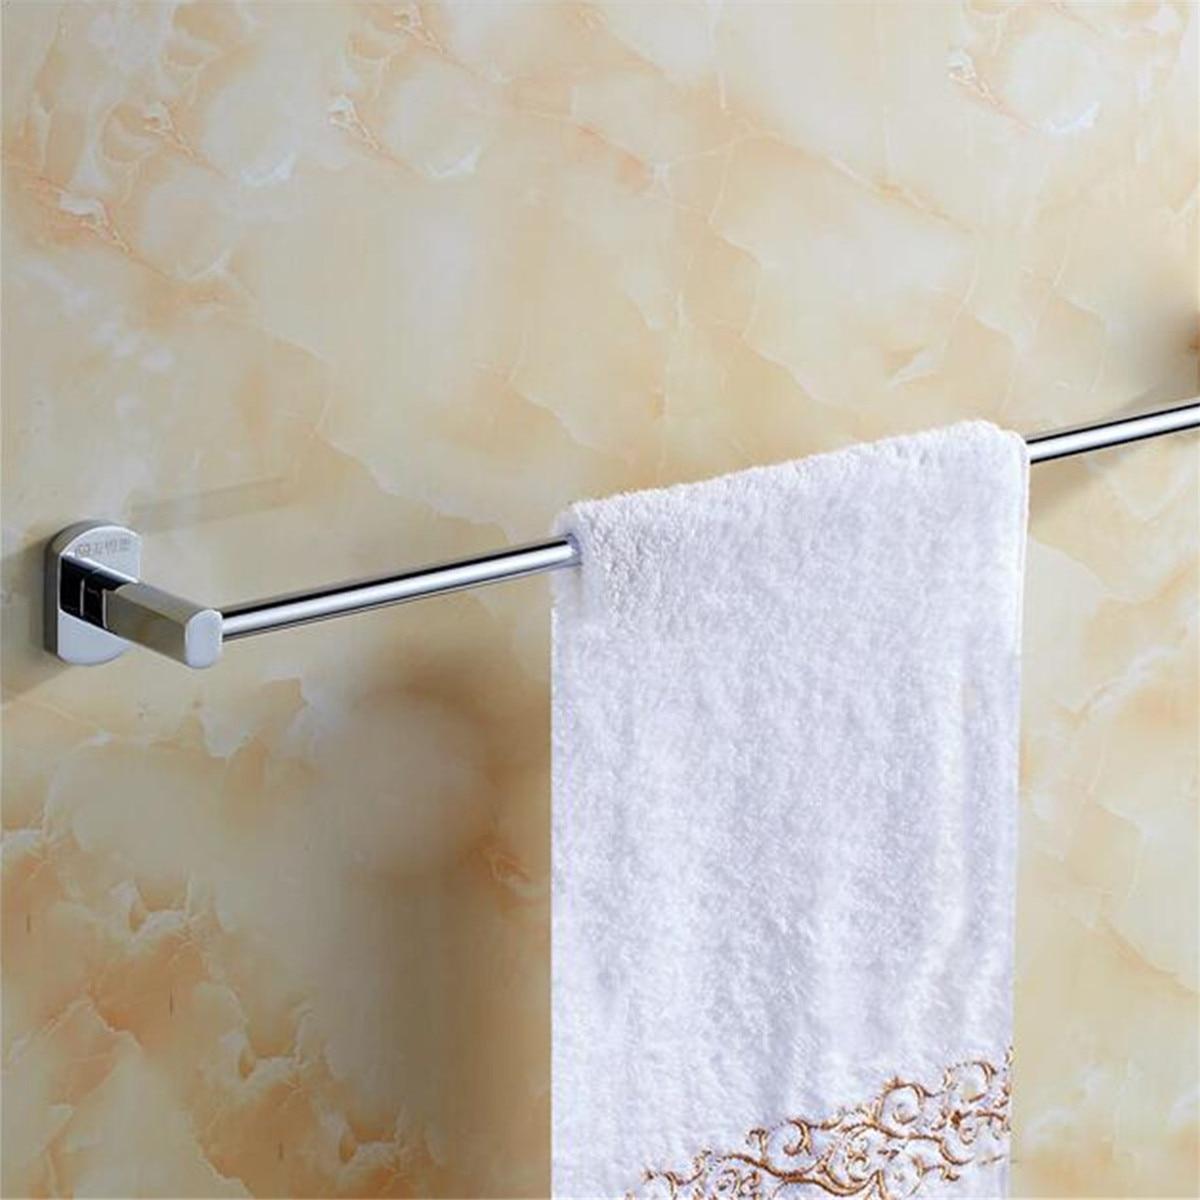 Bath Towel Holder For Wall Part - 50: Chrome Plating Towel Holder Zinc Alloy Wall Mounted Bathroom Bath Towel Rack  Bar Hotel Home Clothes